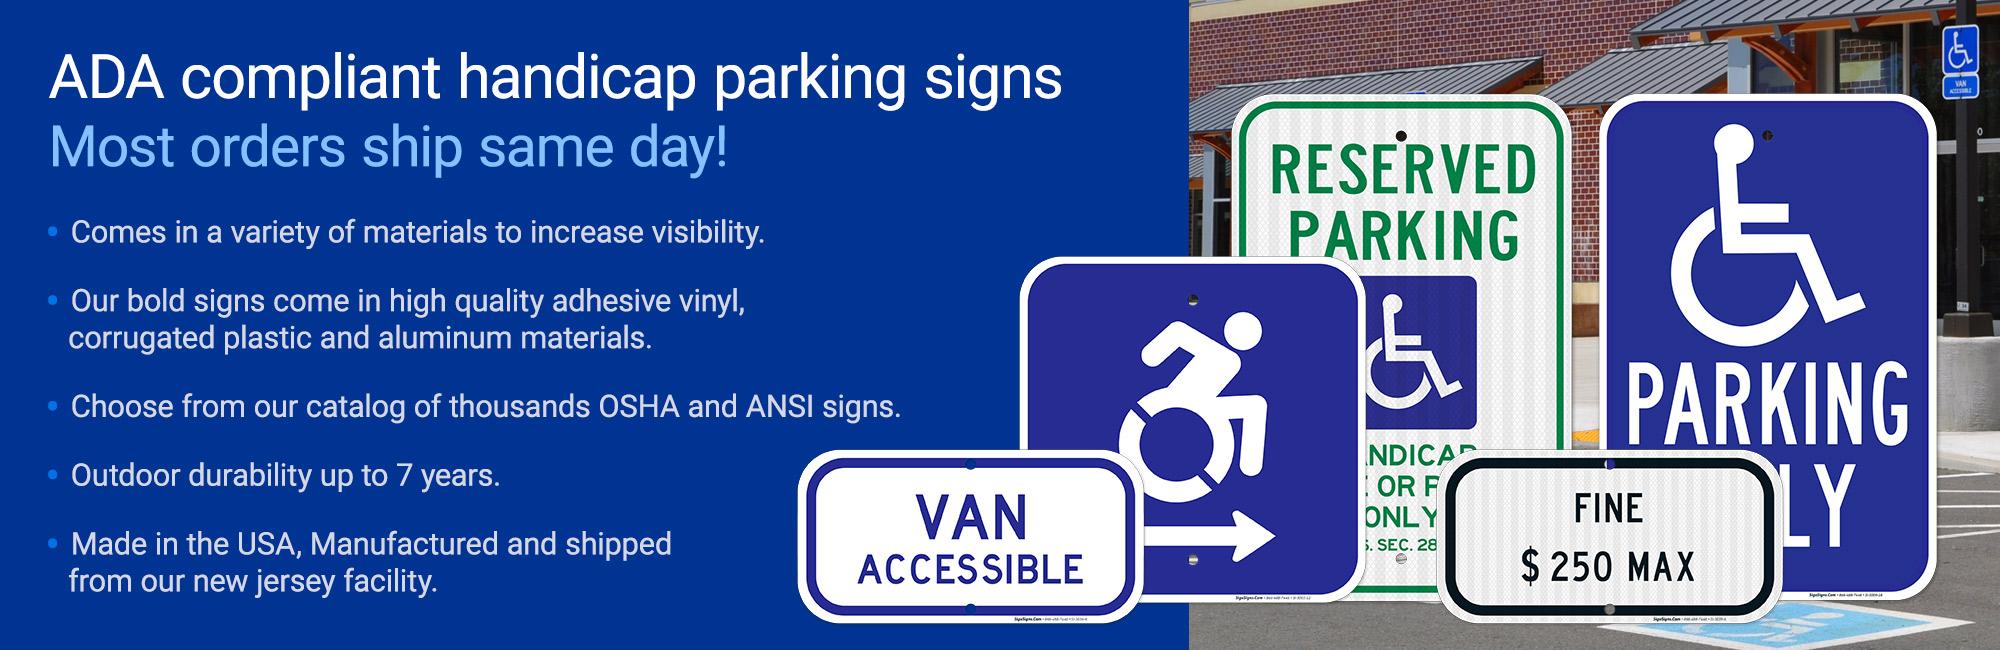 handicap-banner.jpg